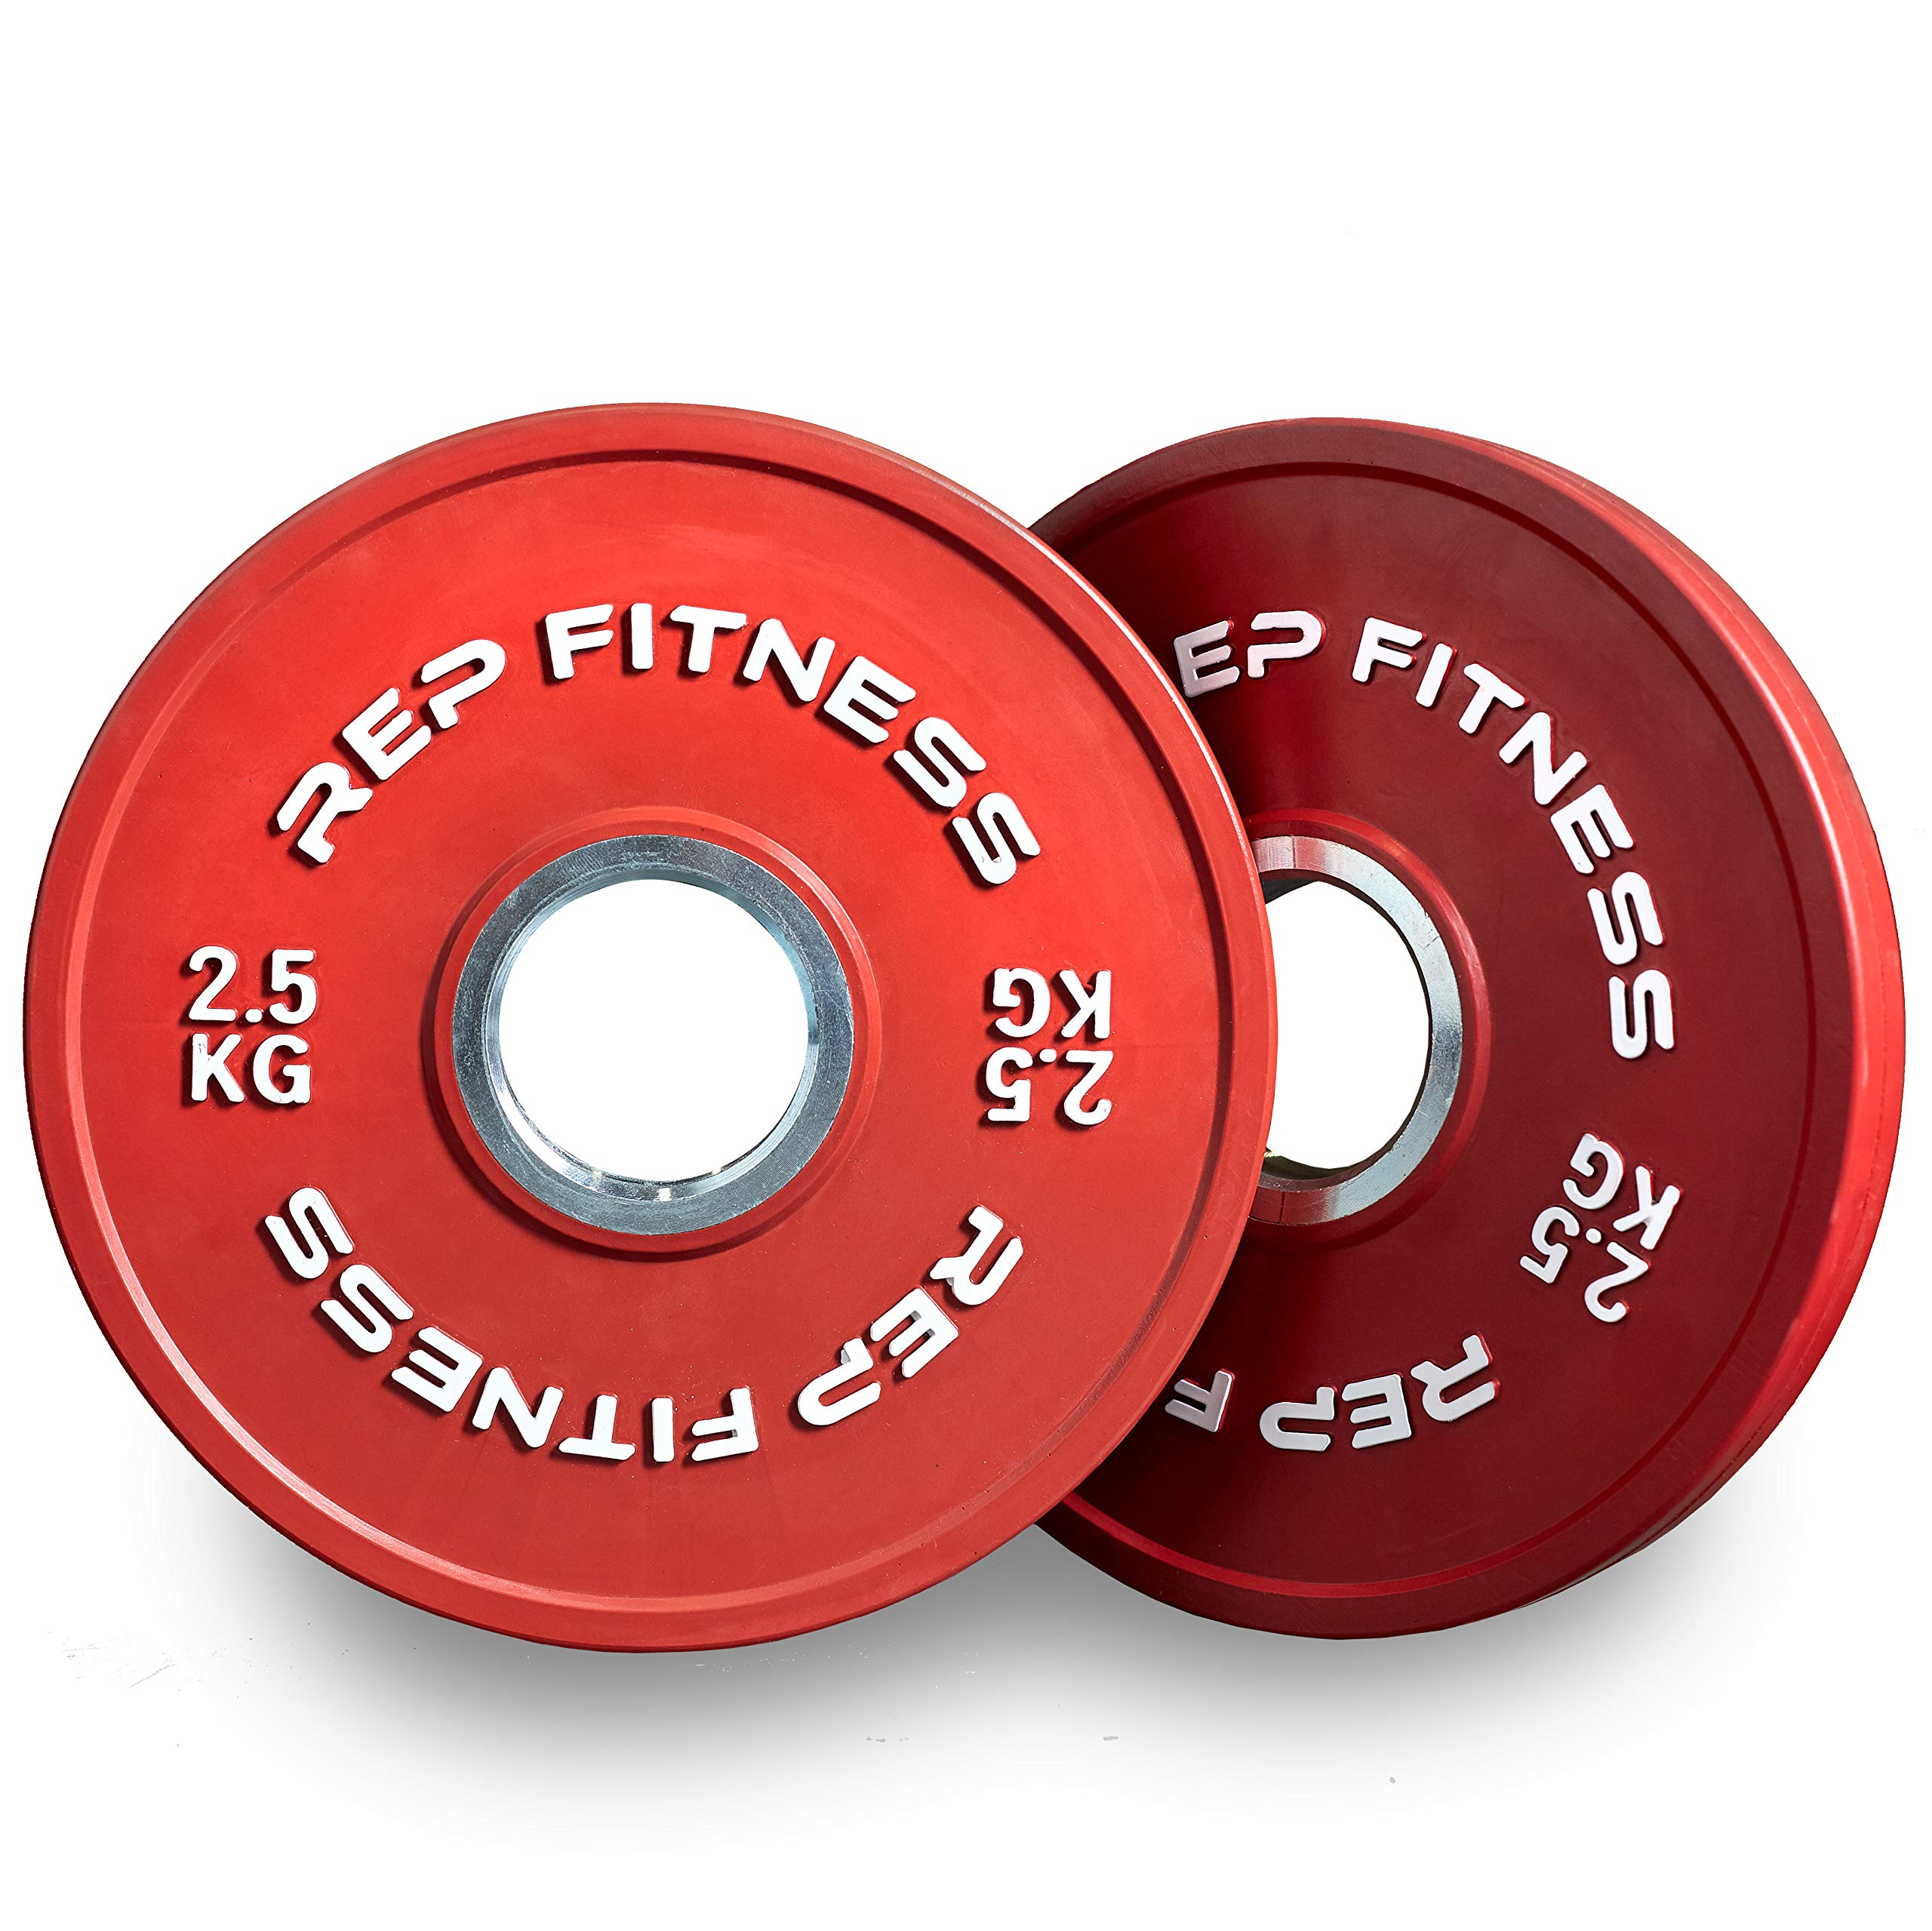 Rep Change Plates - 2.5 kg